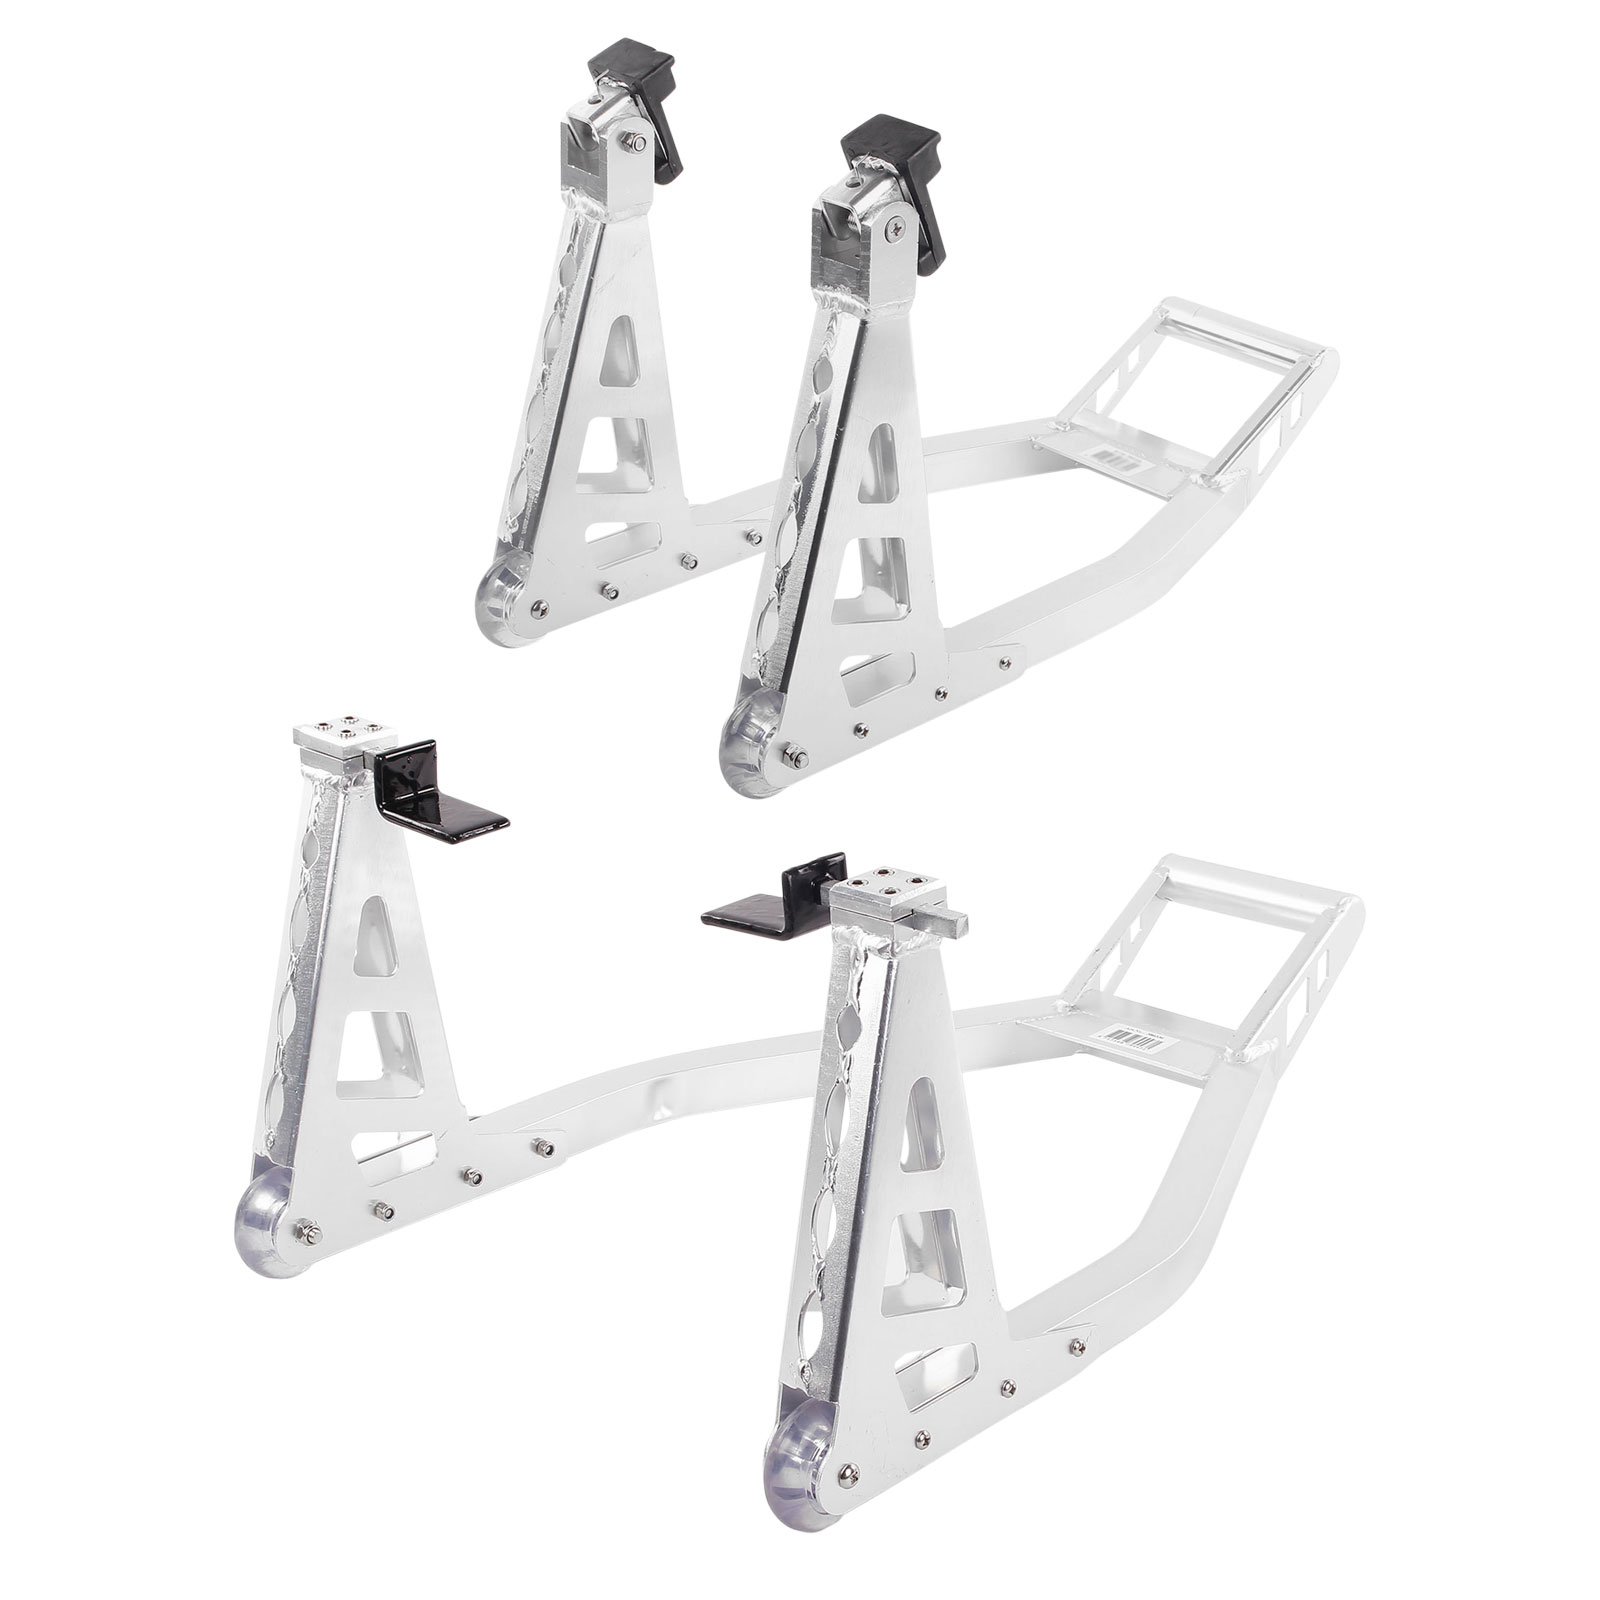 Motorrad Ständer Set Vorne & Hinten Aluminium universell passend 🏍️